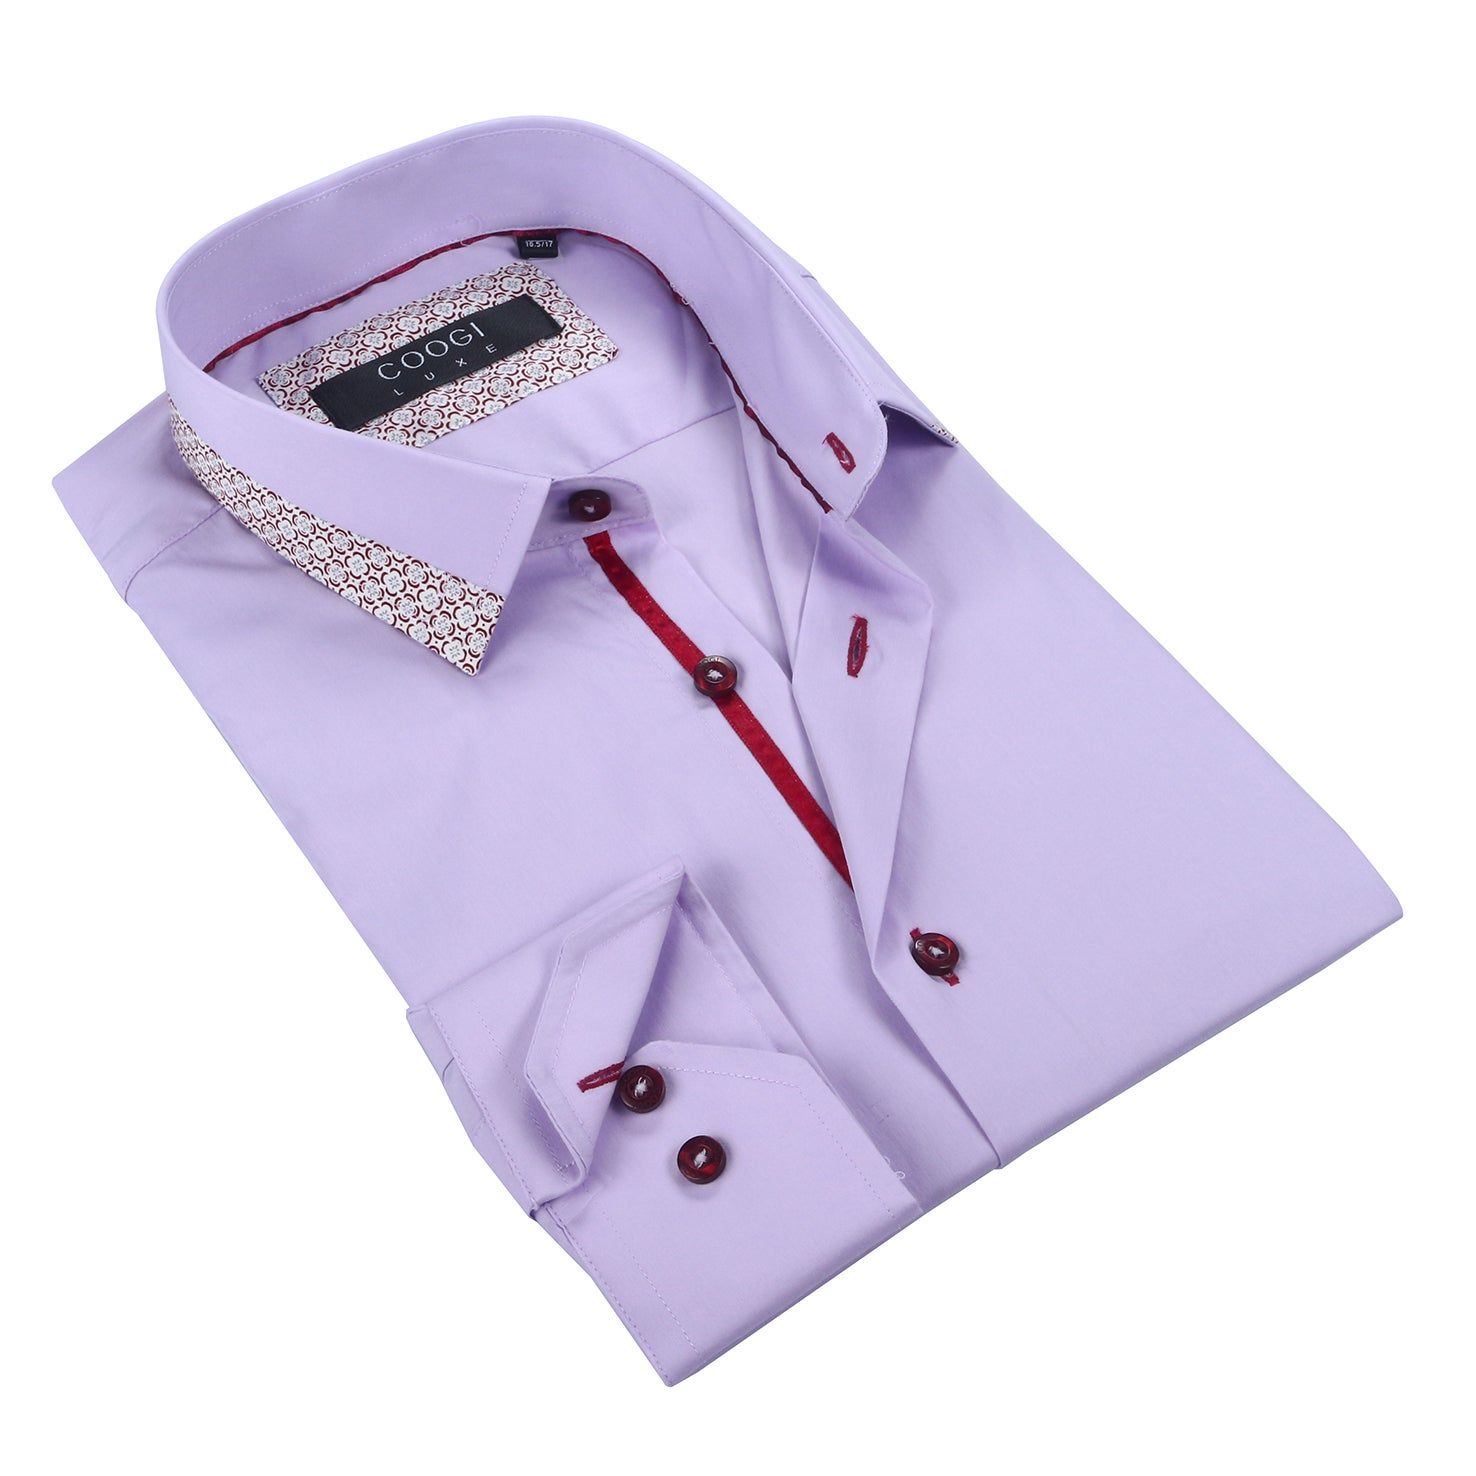 Coogi Mens Solid Purple Dress Shirt (Large), Size L